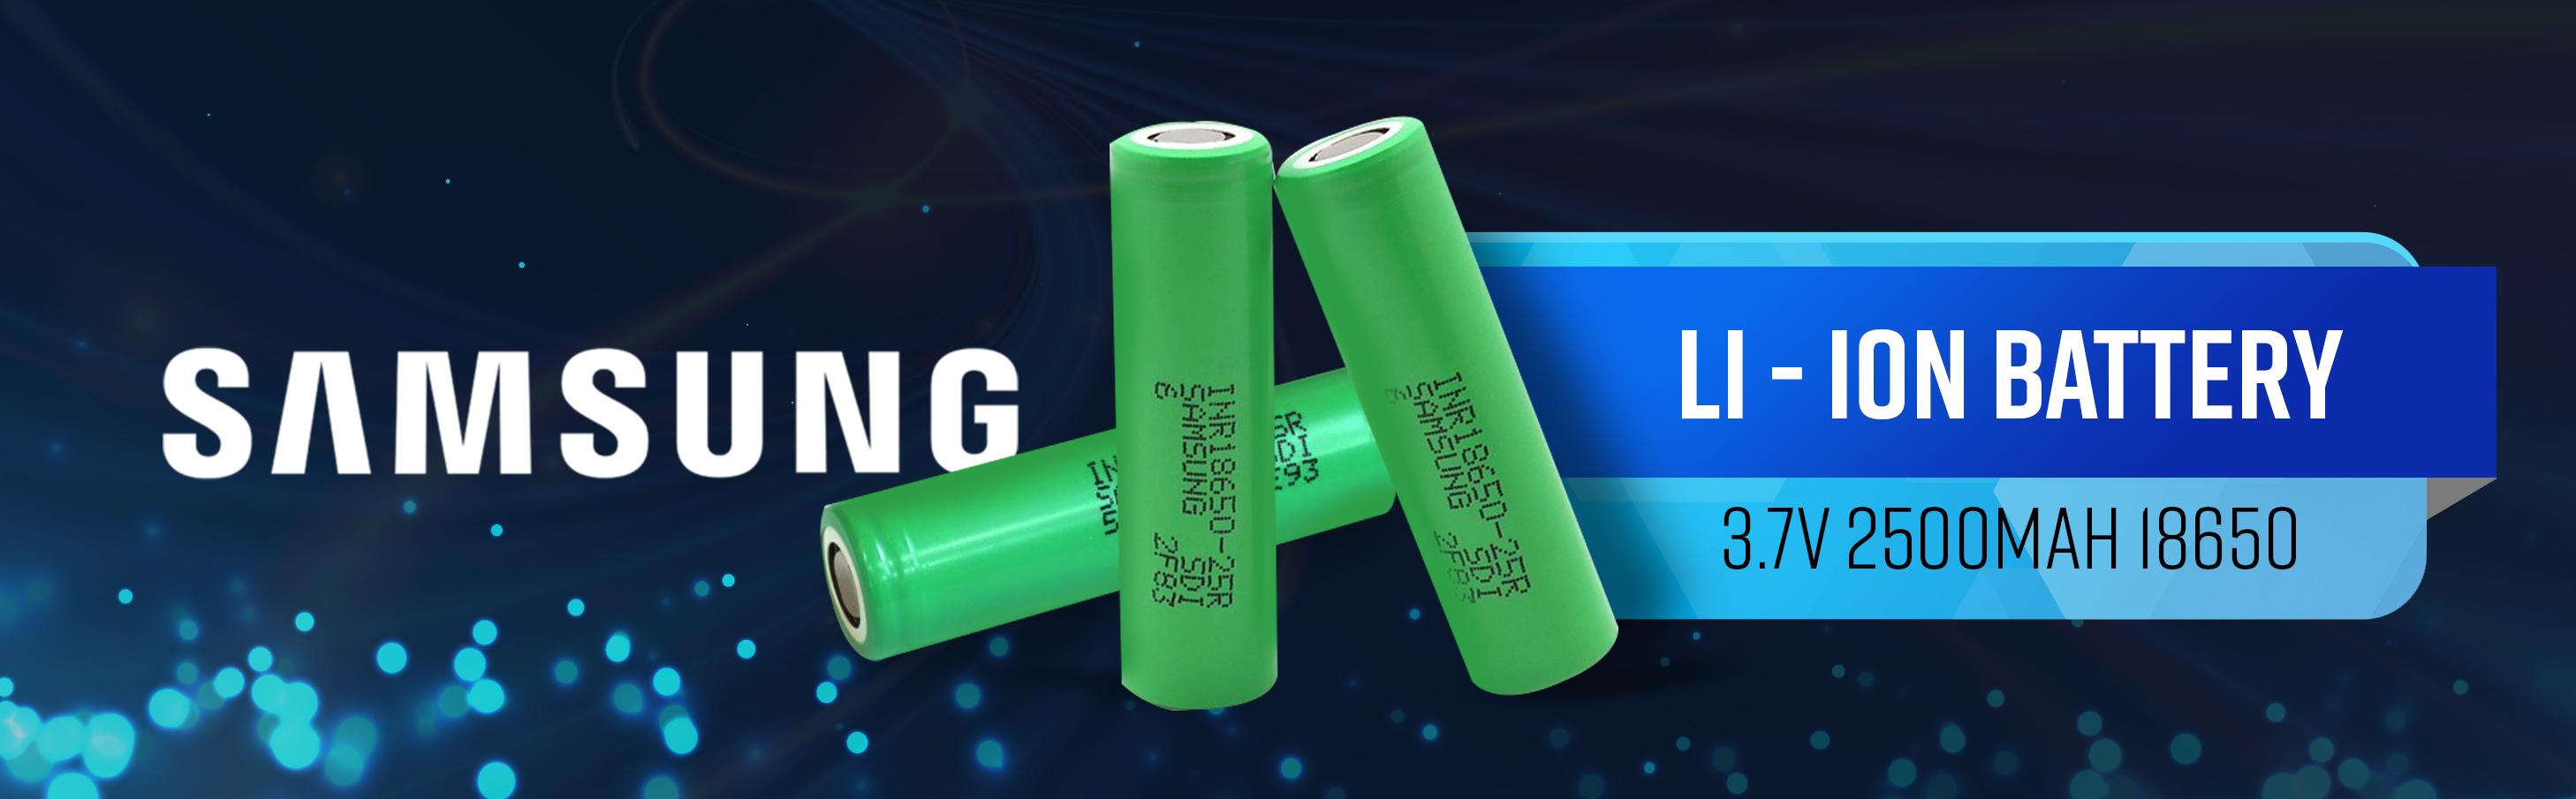 accessories-batteries.jpg